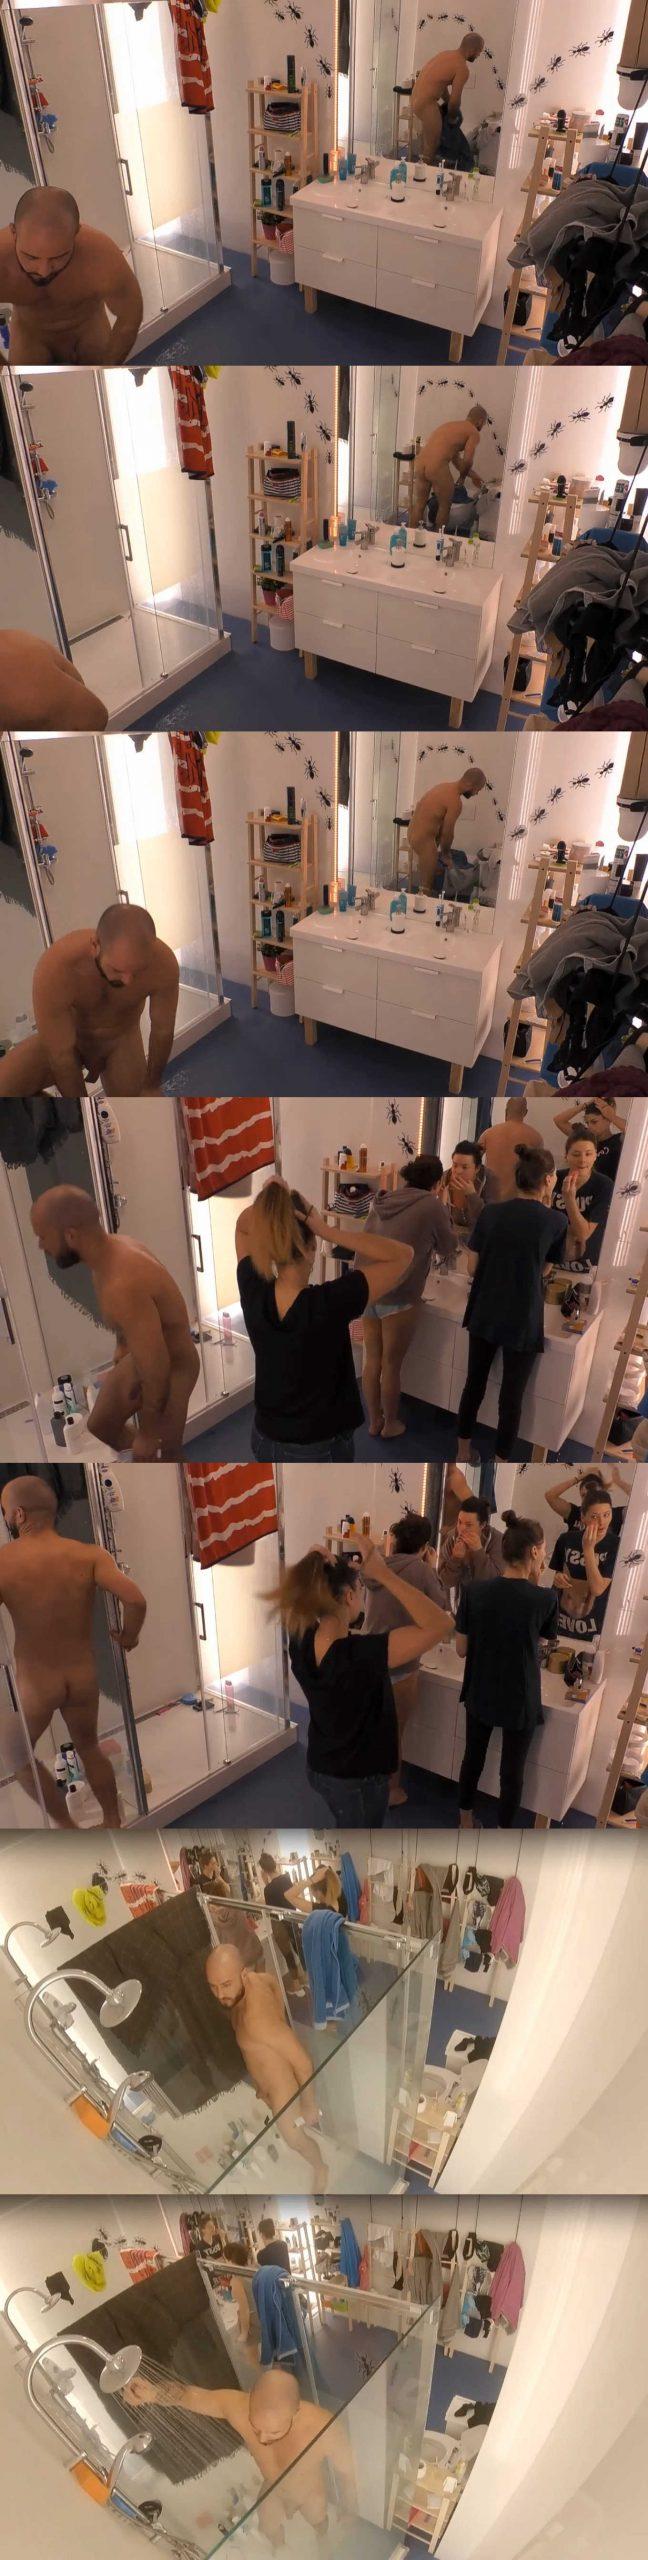 Maciej naked in polish big brother